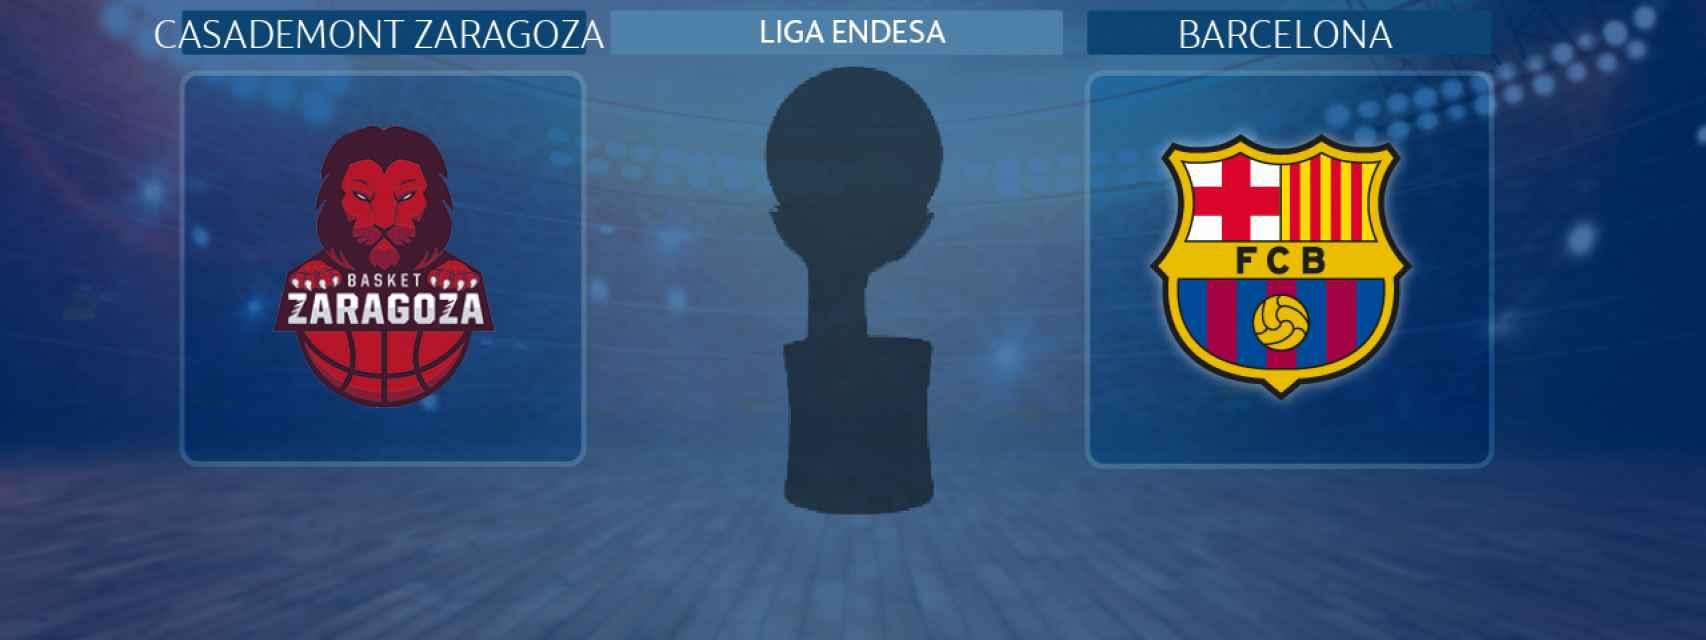 Casademont Zaragoza - Barcelona, partido de la Liga Endesa